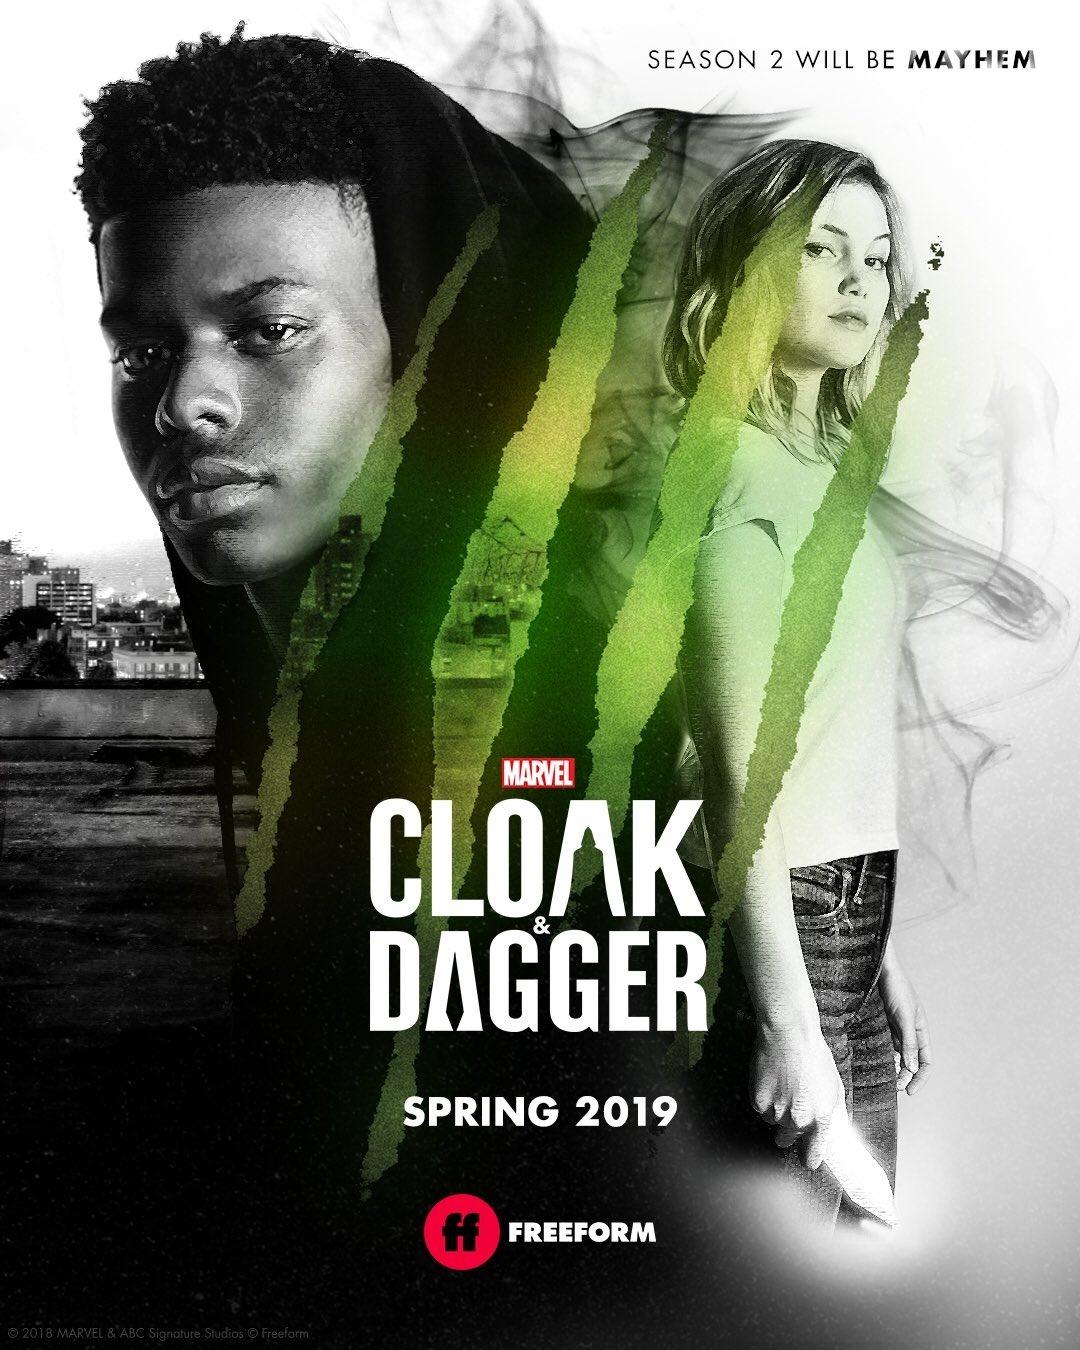 Cloak & Dagger Season 1 COMPLETE WEBRip 480p, 720p & 1080p